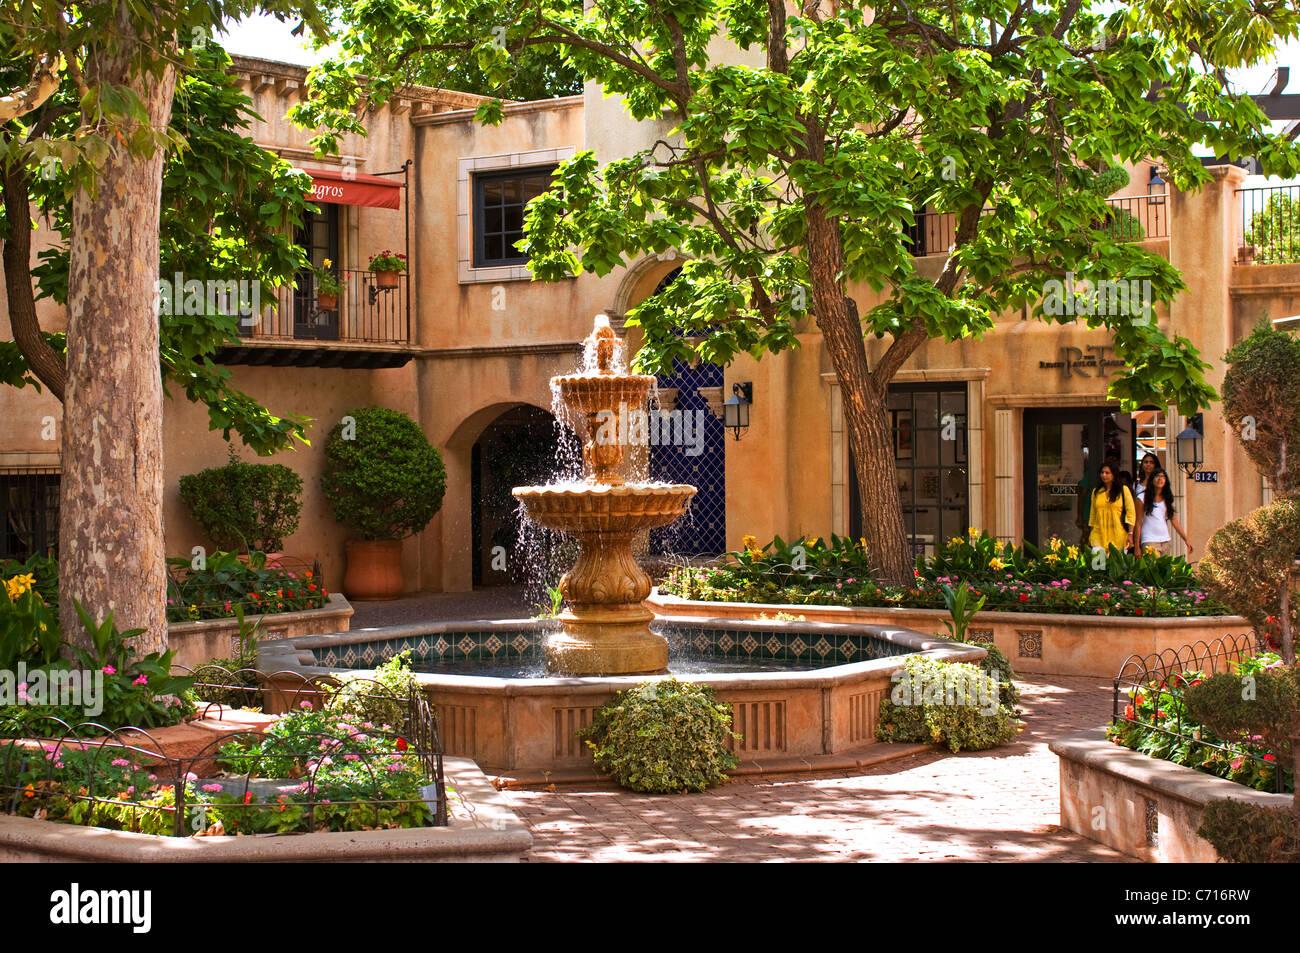 Spanish Style Tiered Fountain Patio Courtyard Stock Photo